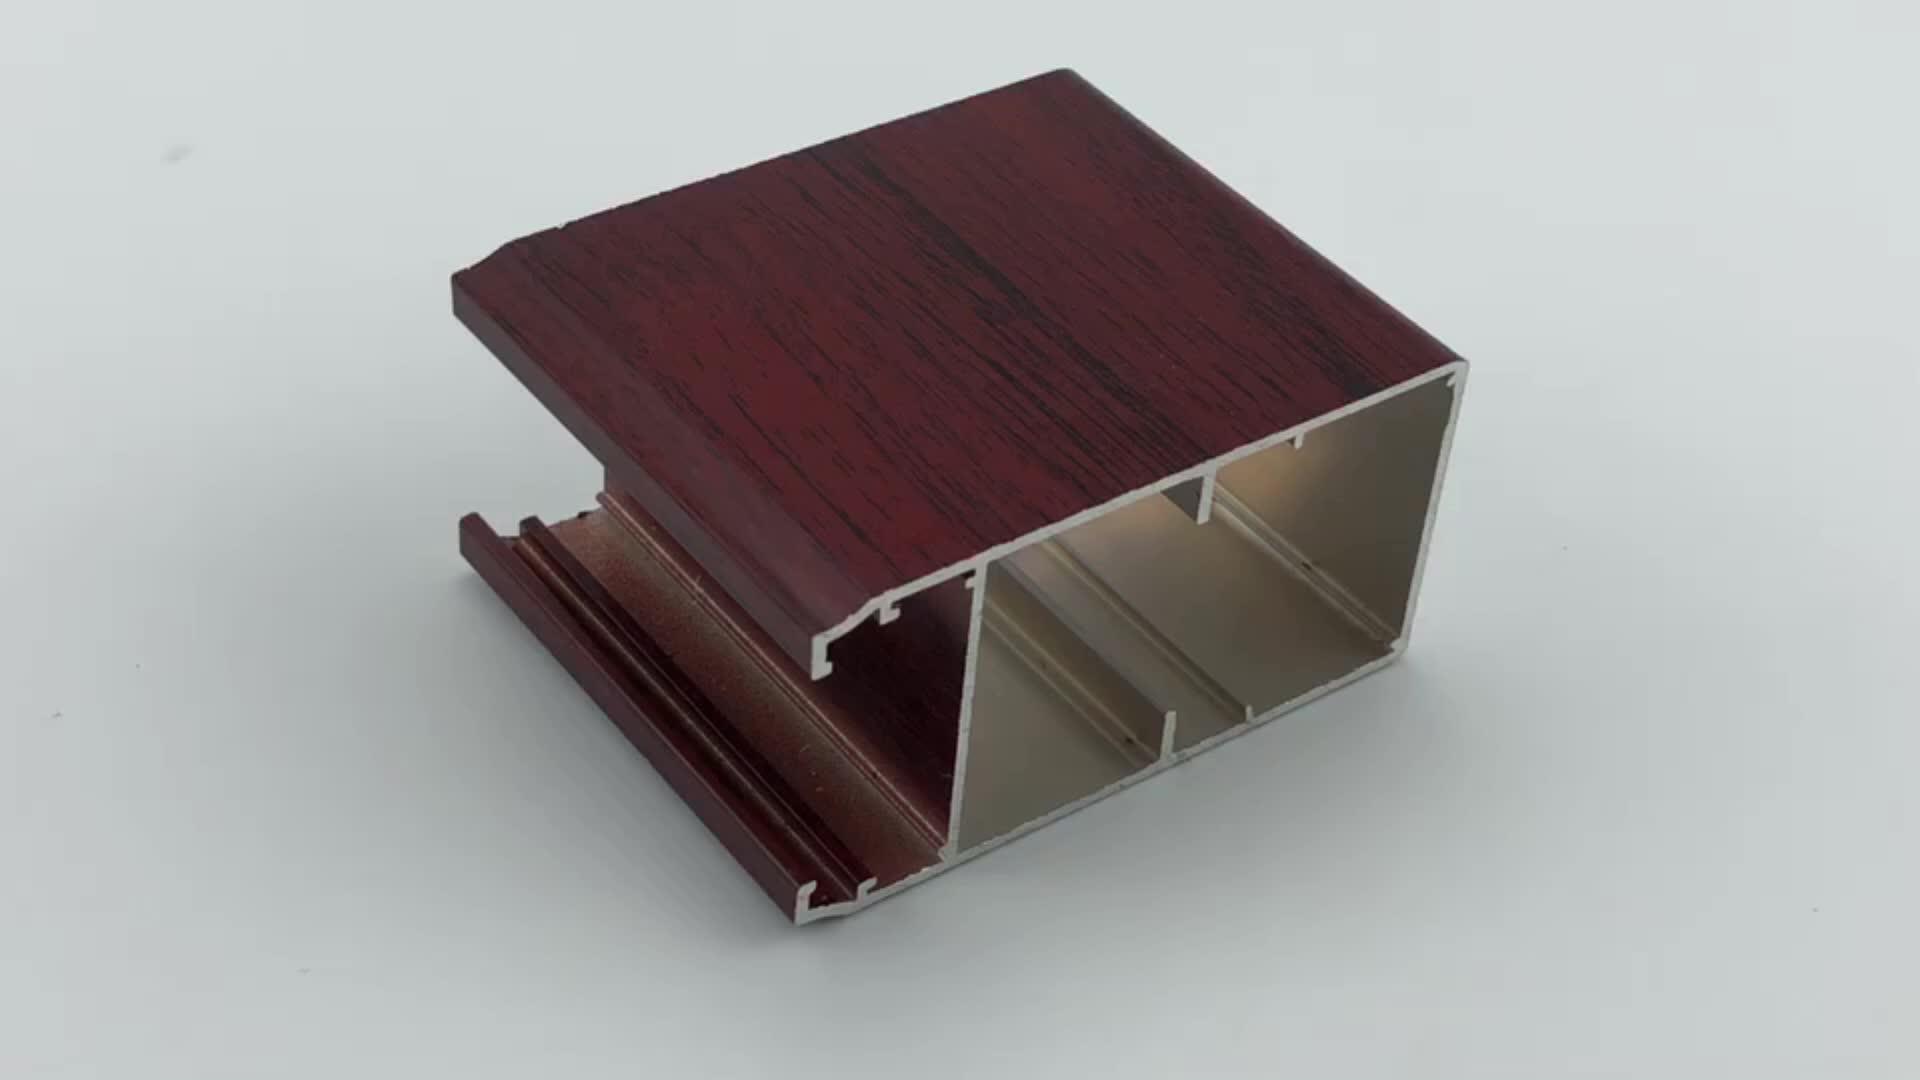 Wood grain aluminium profile in dubai supplier,wood finish aluminium price per kilo,foshan nanhai aluminium 6061 t6 tube